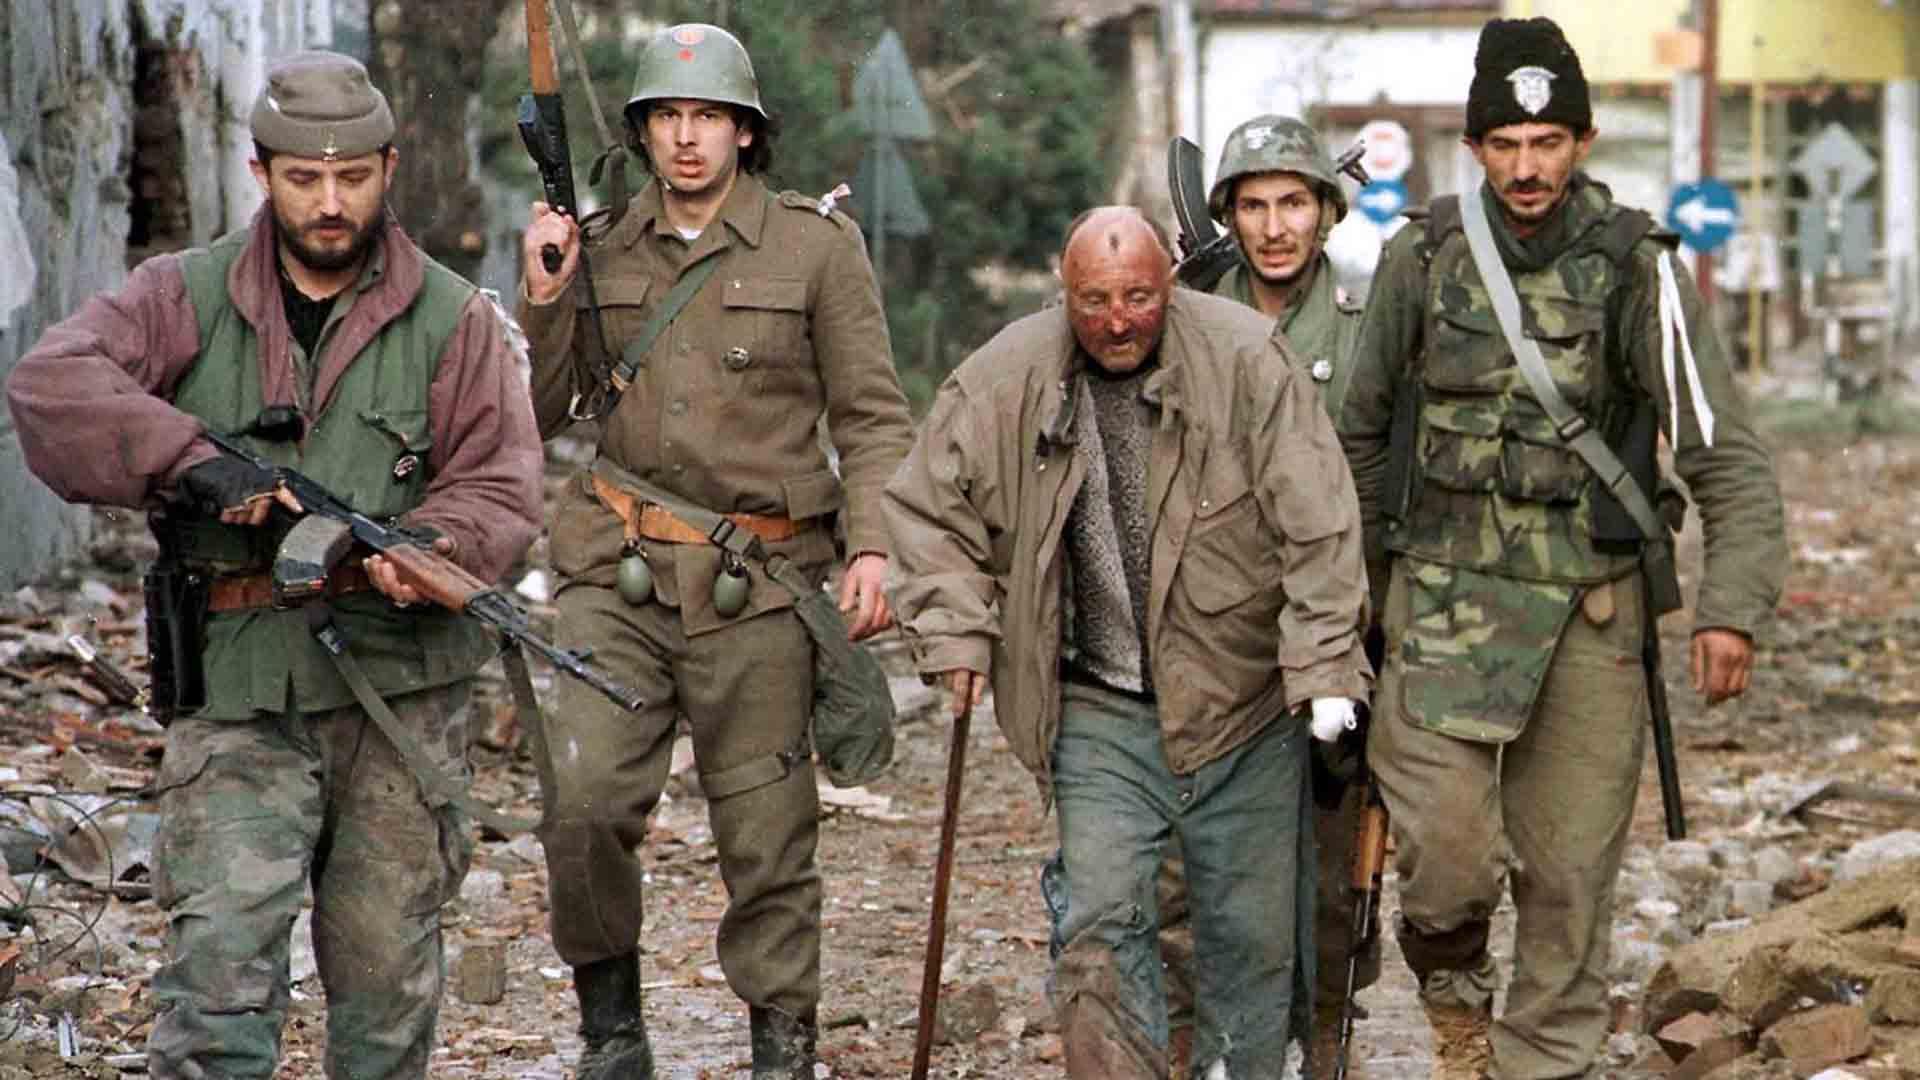 La guerra in Jugoslavia è stata l